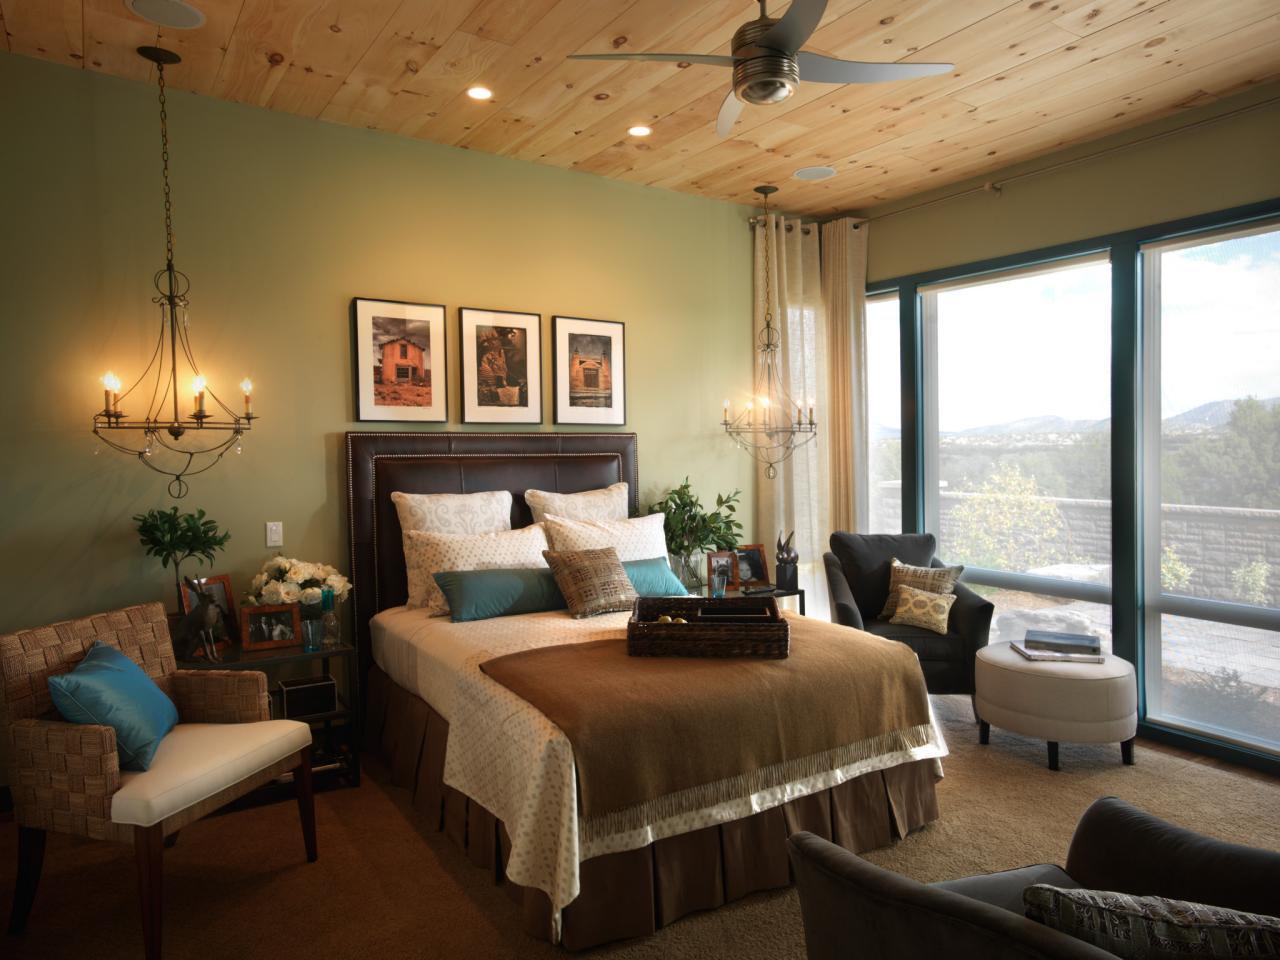 10 Unique Master Bedroom Wall Color Ideas %name